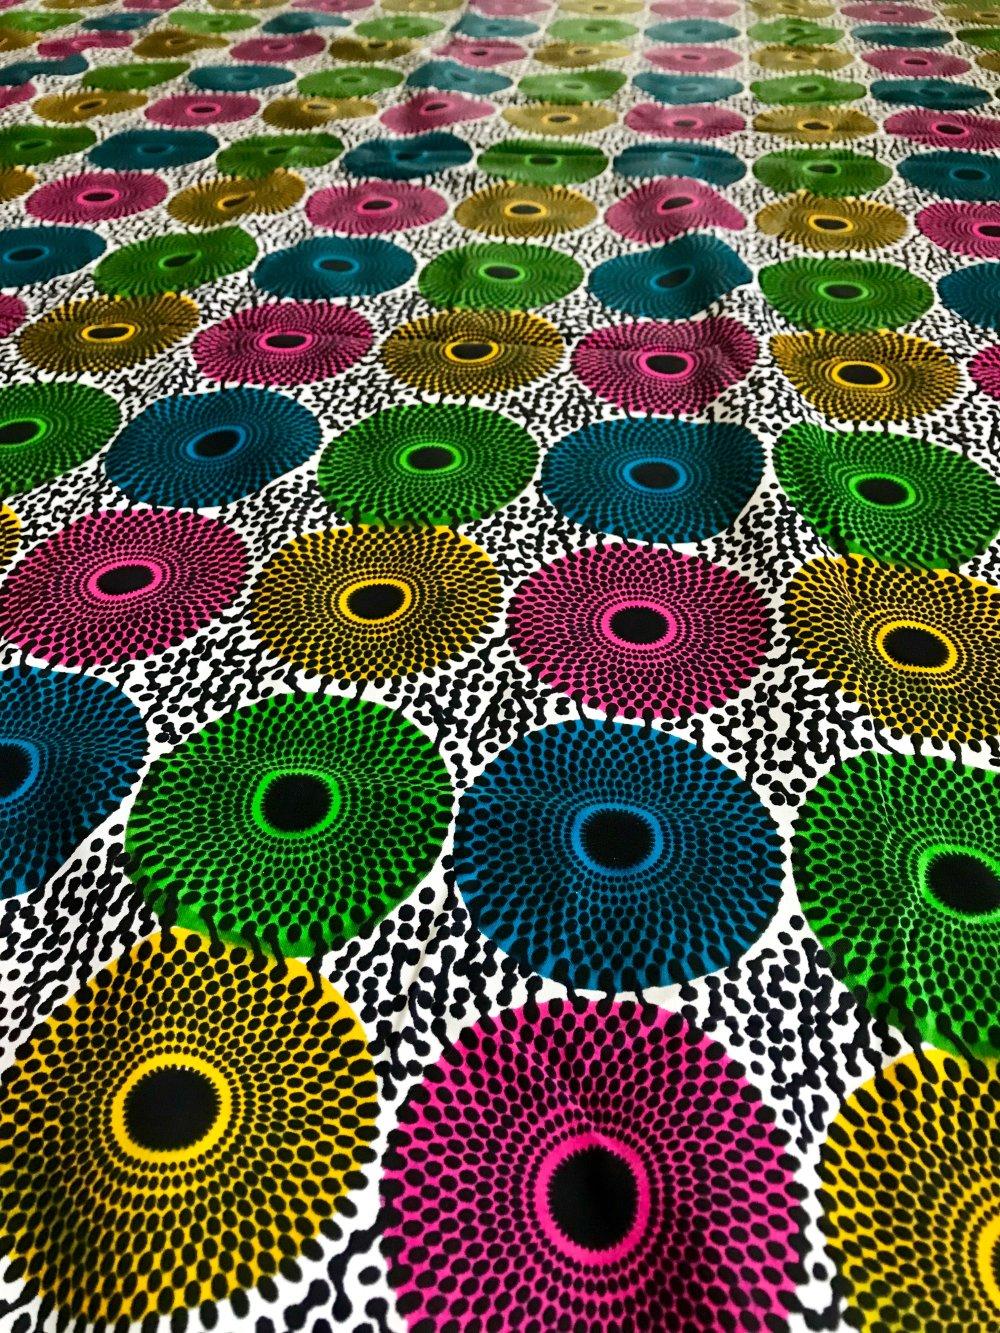 Tissu Wax - Cercles Multicolores , Fond Blanc - Véritable Wax Block Prints Hitarget